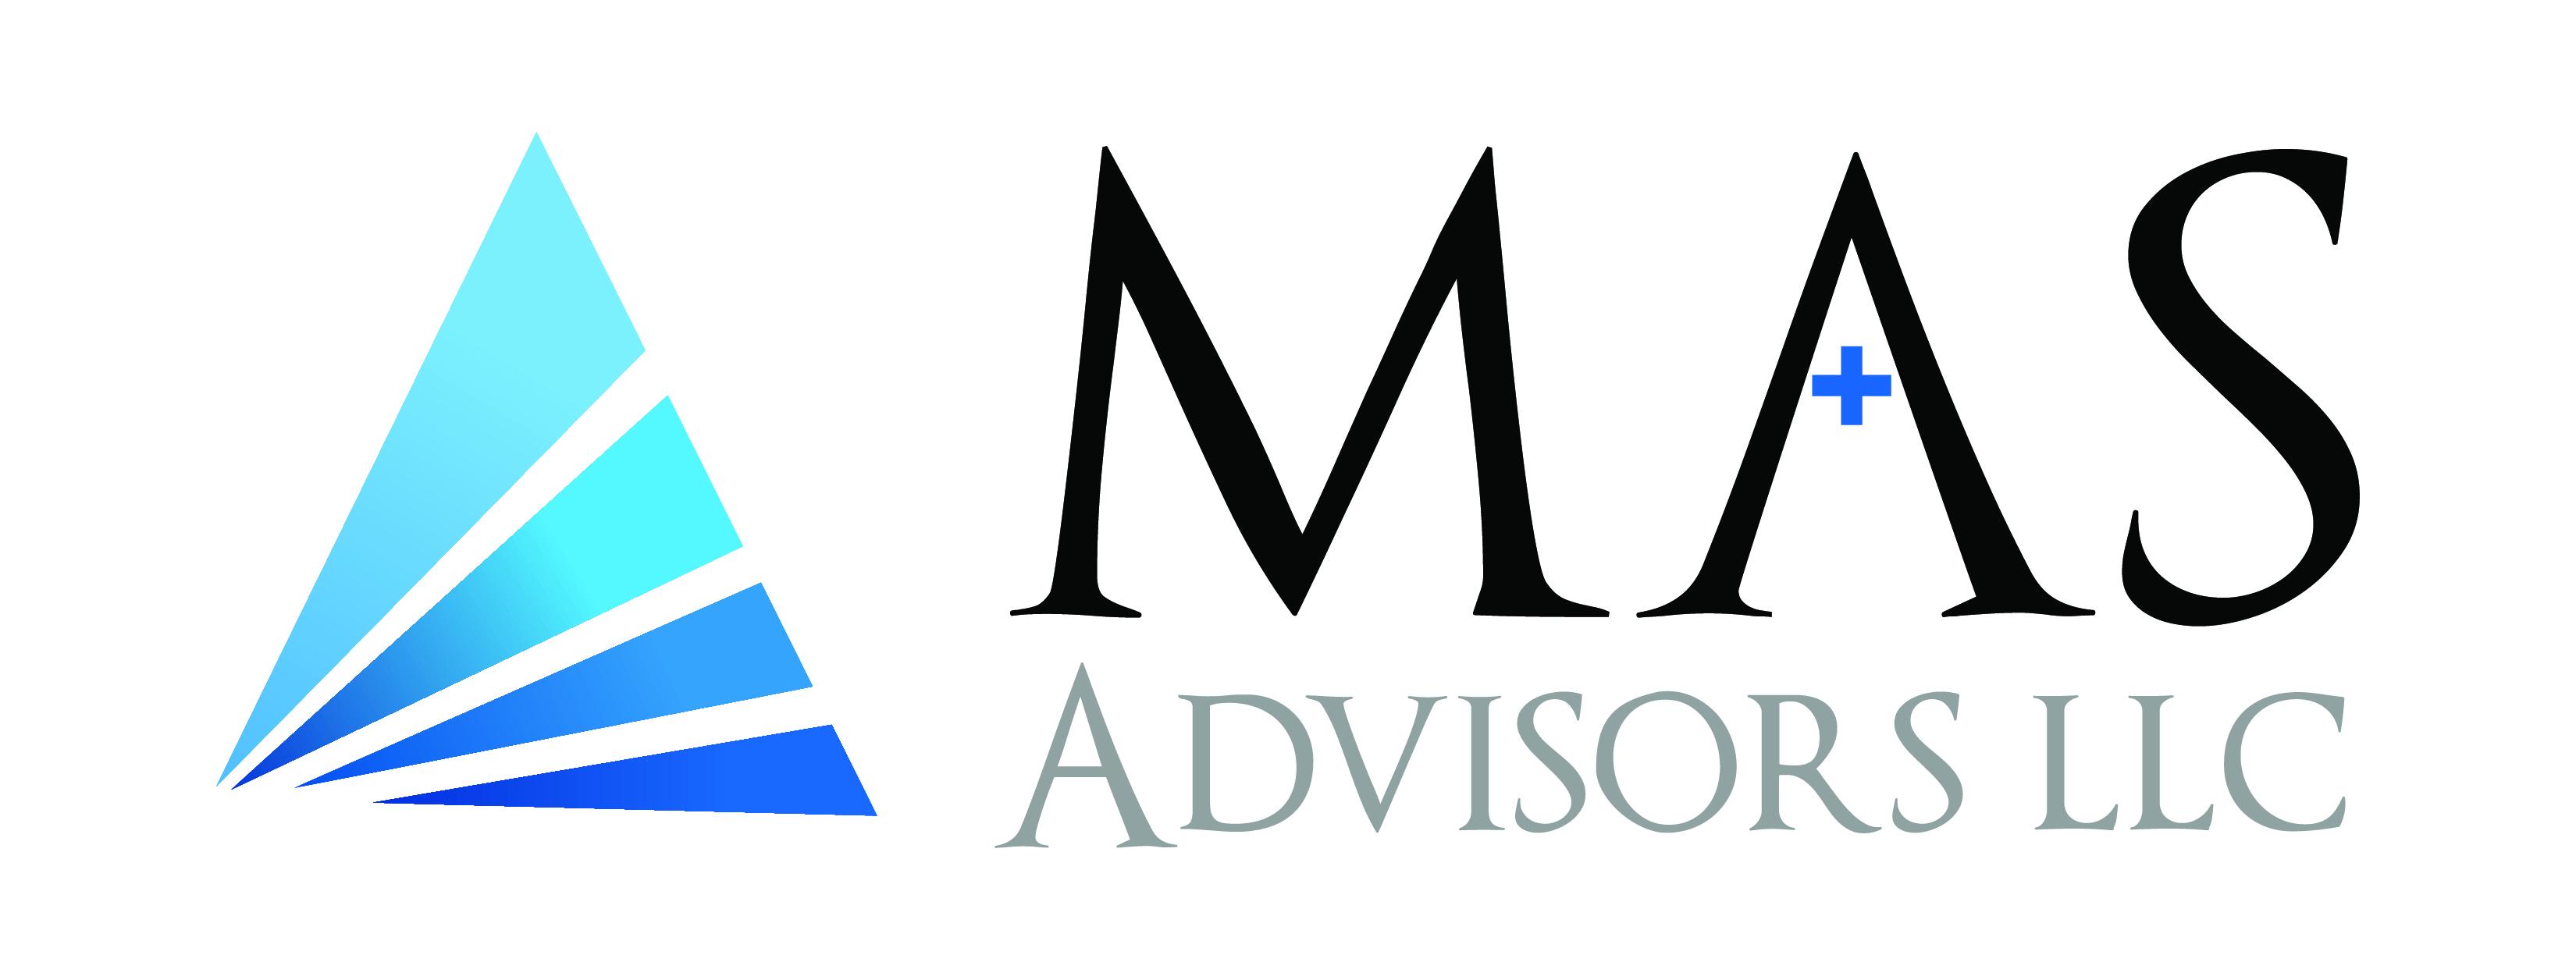 MAS Advisors, LLC Acquires Insurance Agency, Synergy Life Brokerage Group